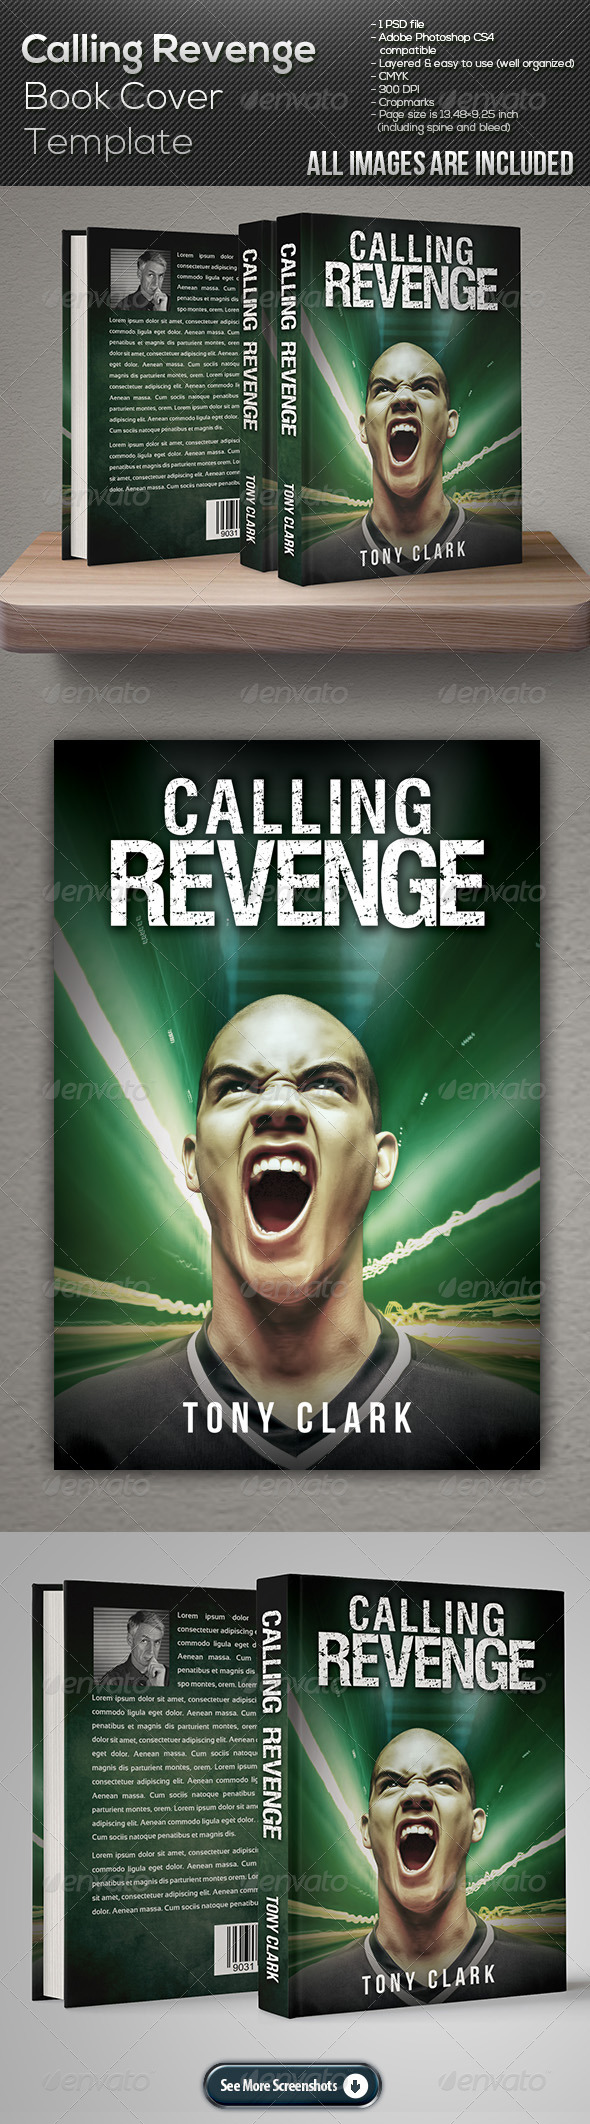 GraphicRiver Calling Revenge Book Cover Template 7675499